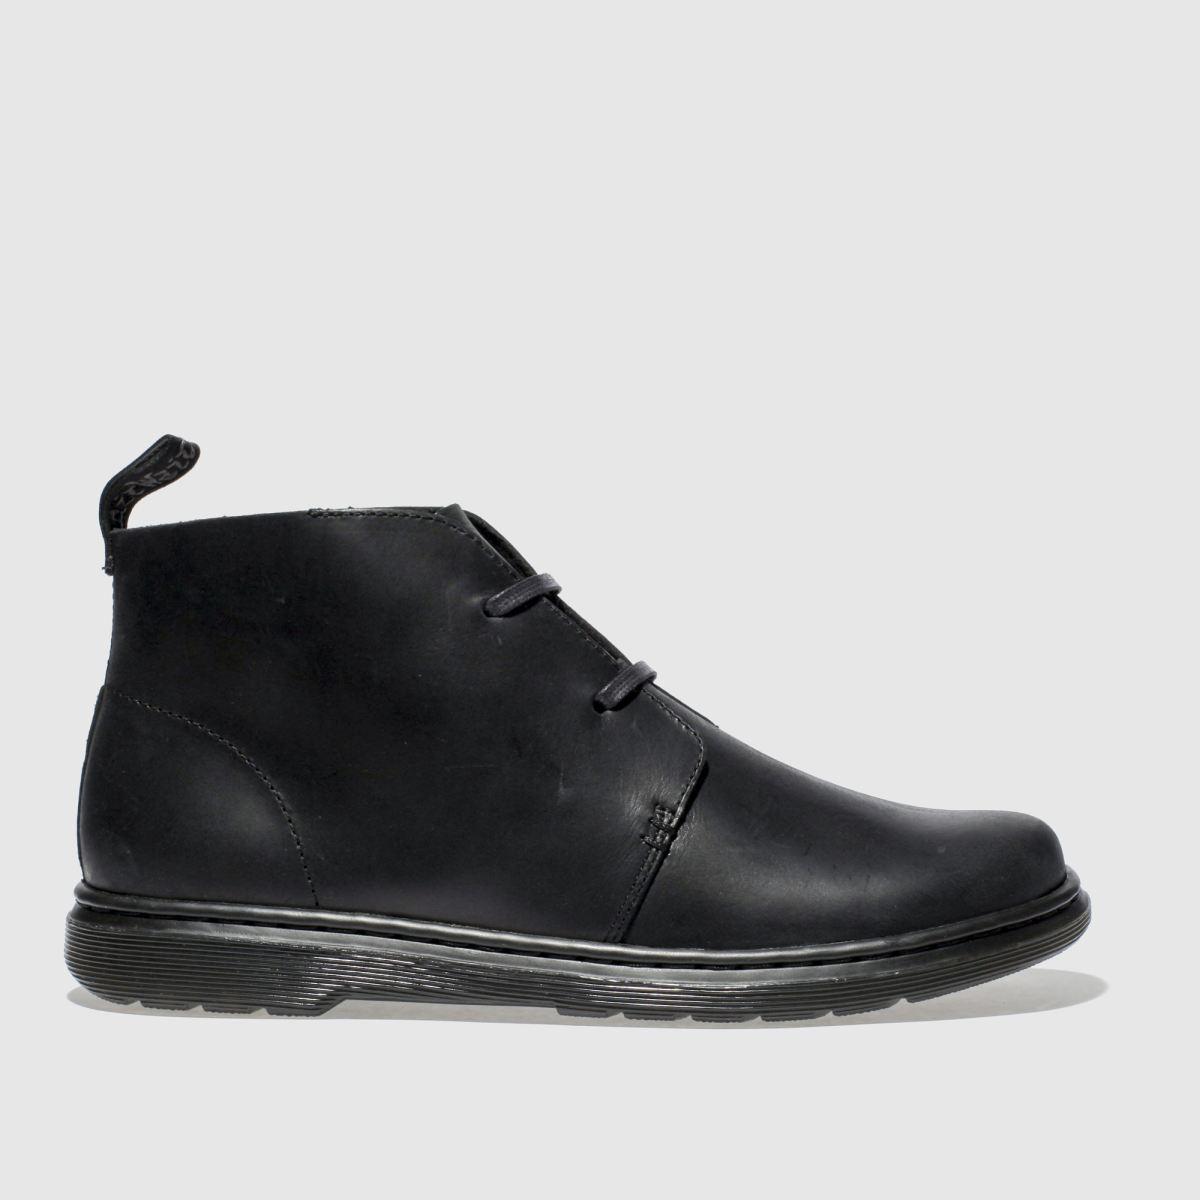 Dr Martens Black Cynthia Boots